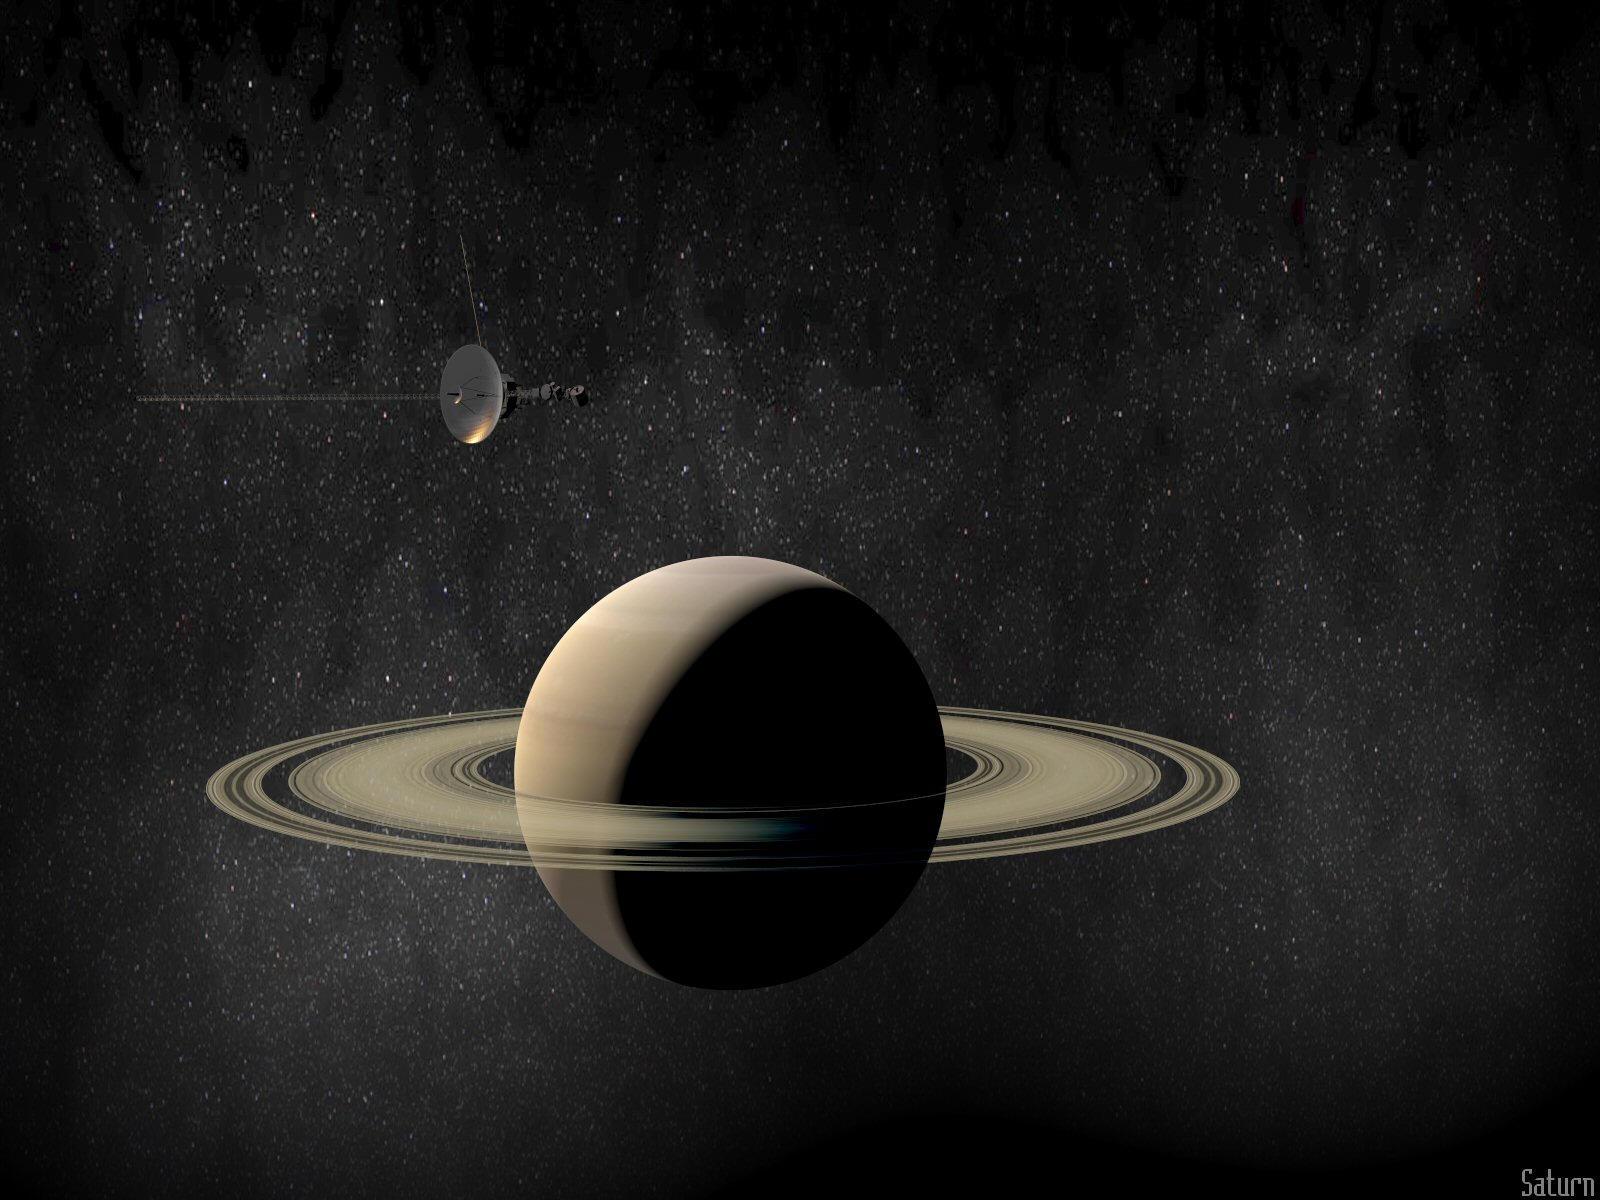 Saturn 5 by swarfega